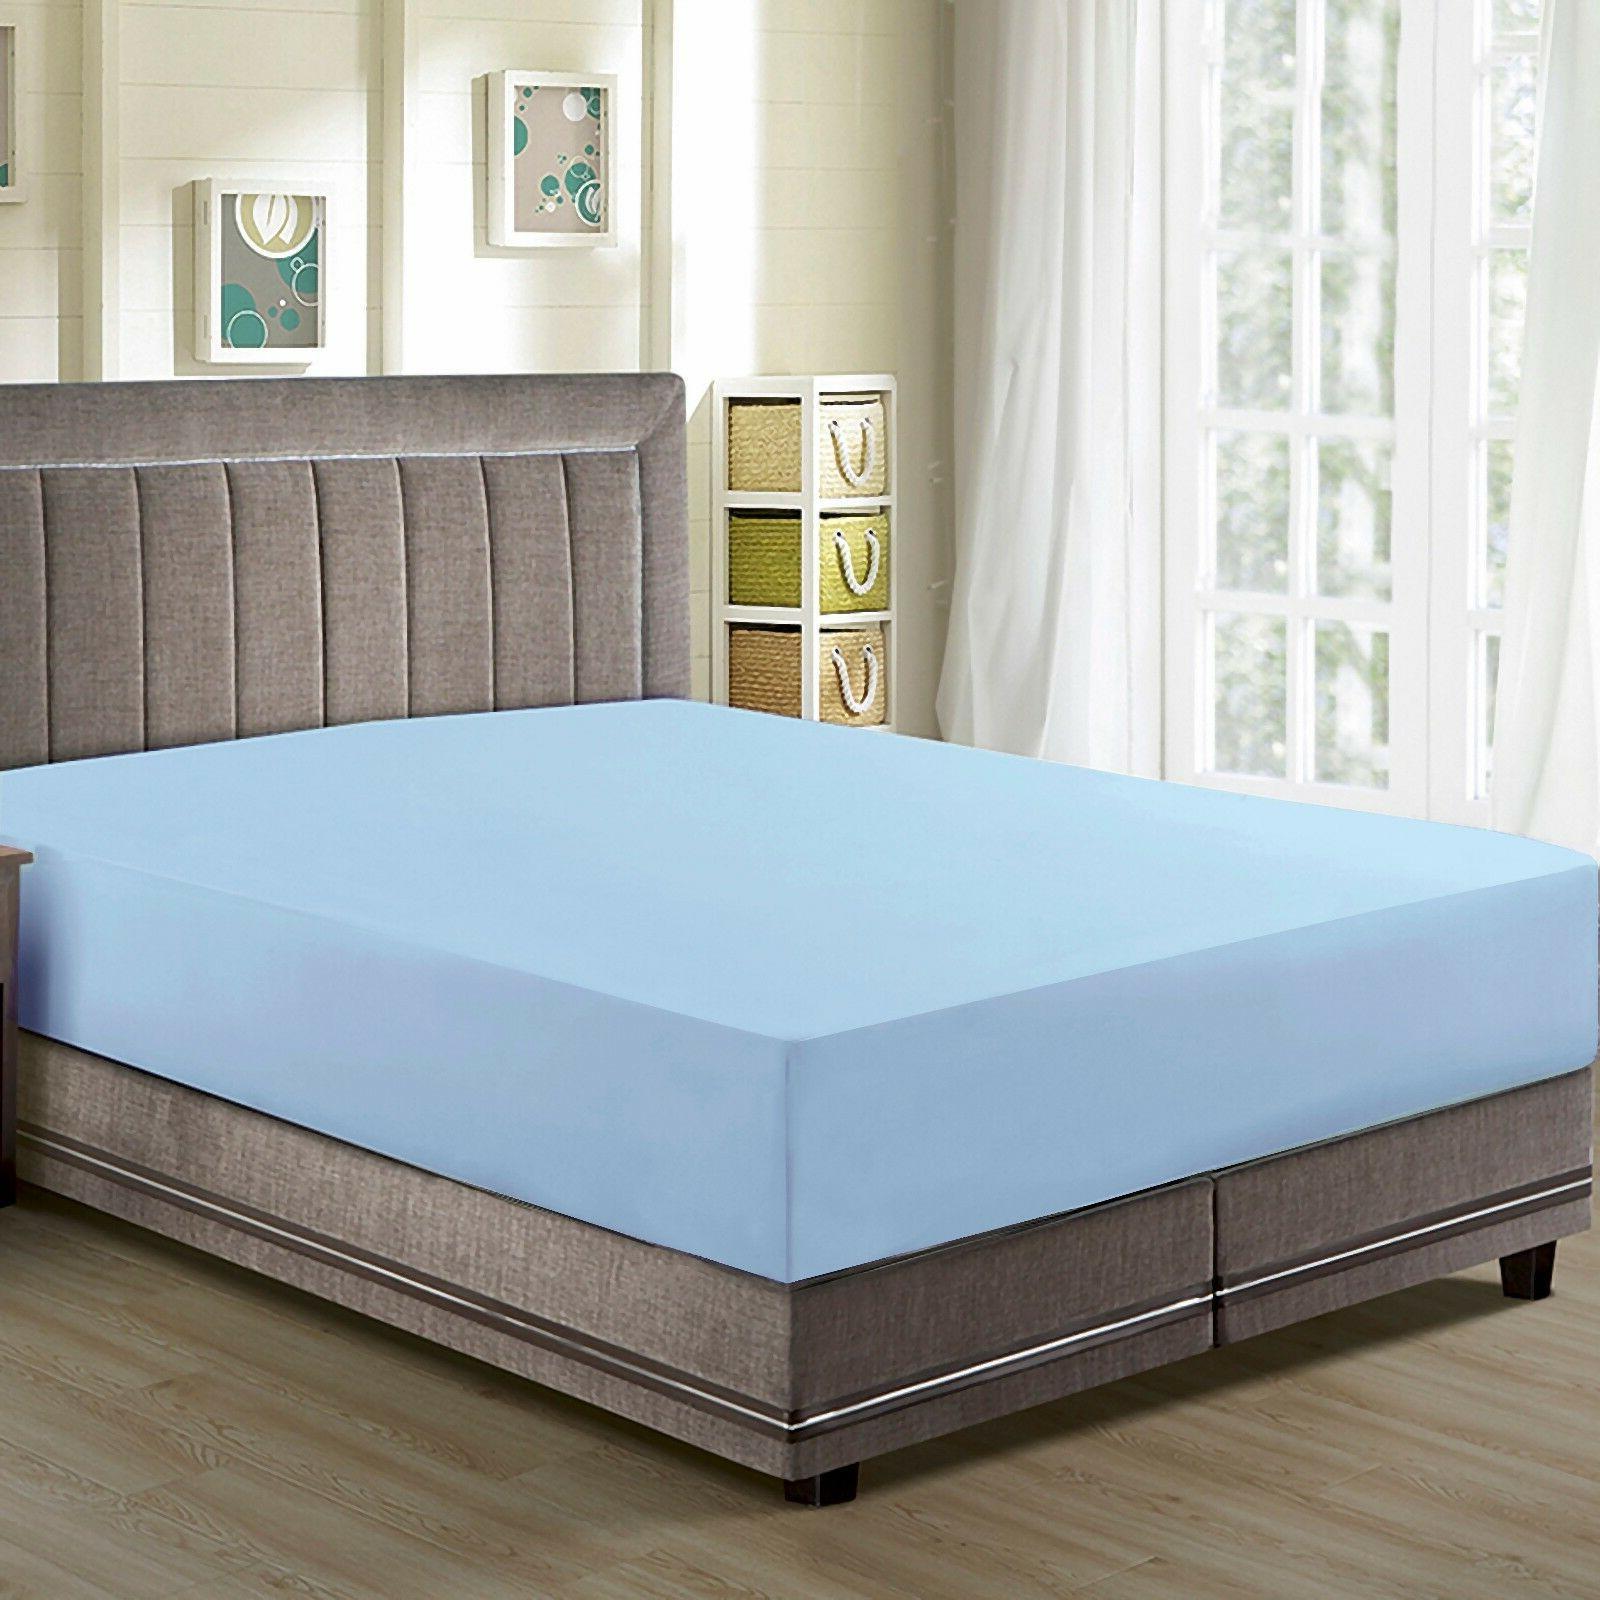 CC&DD- Fitted Sheet , Premier 1800 ,Luxury Super Silky Soft,